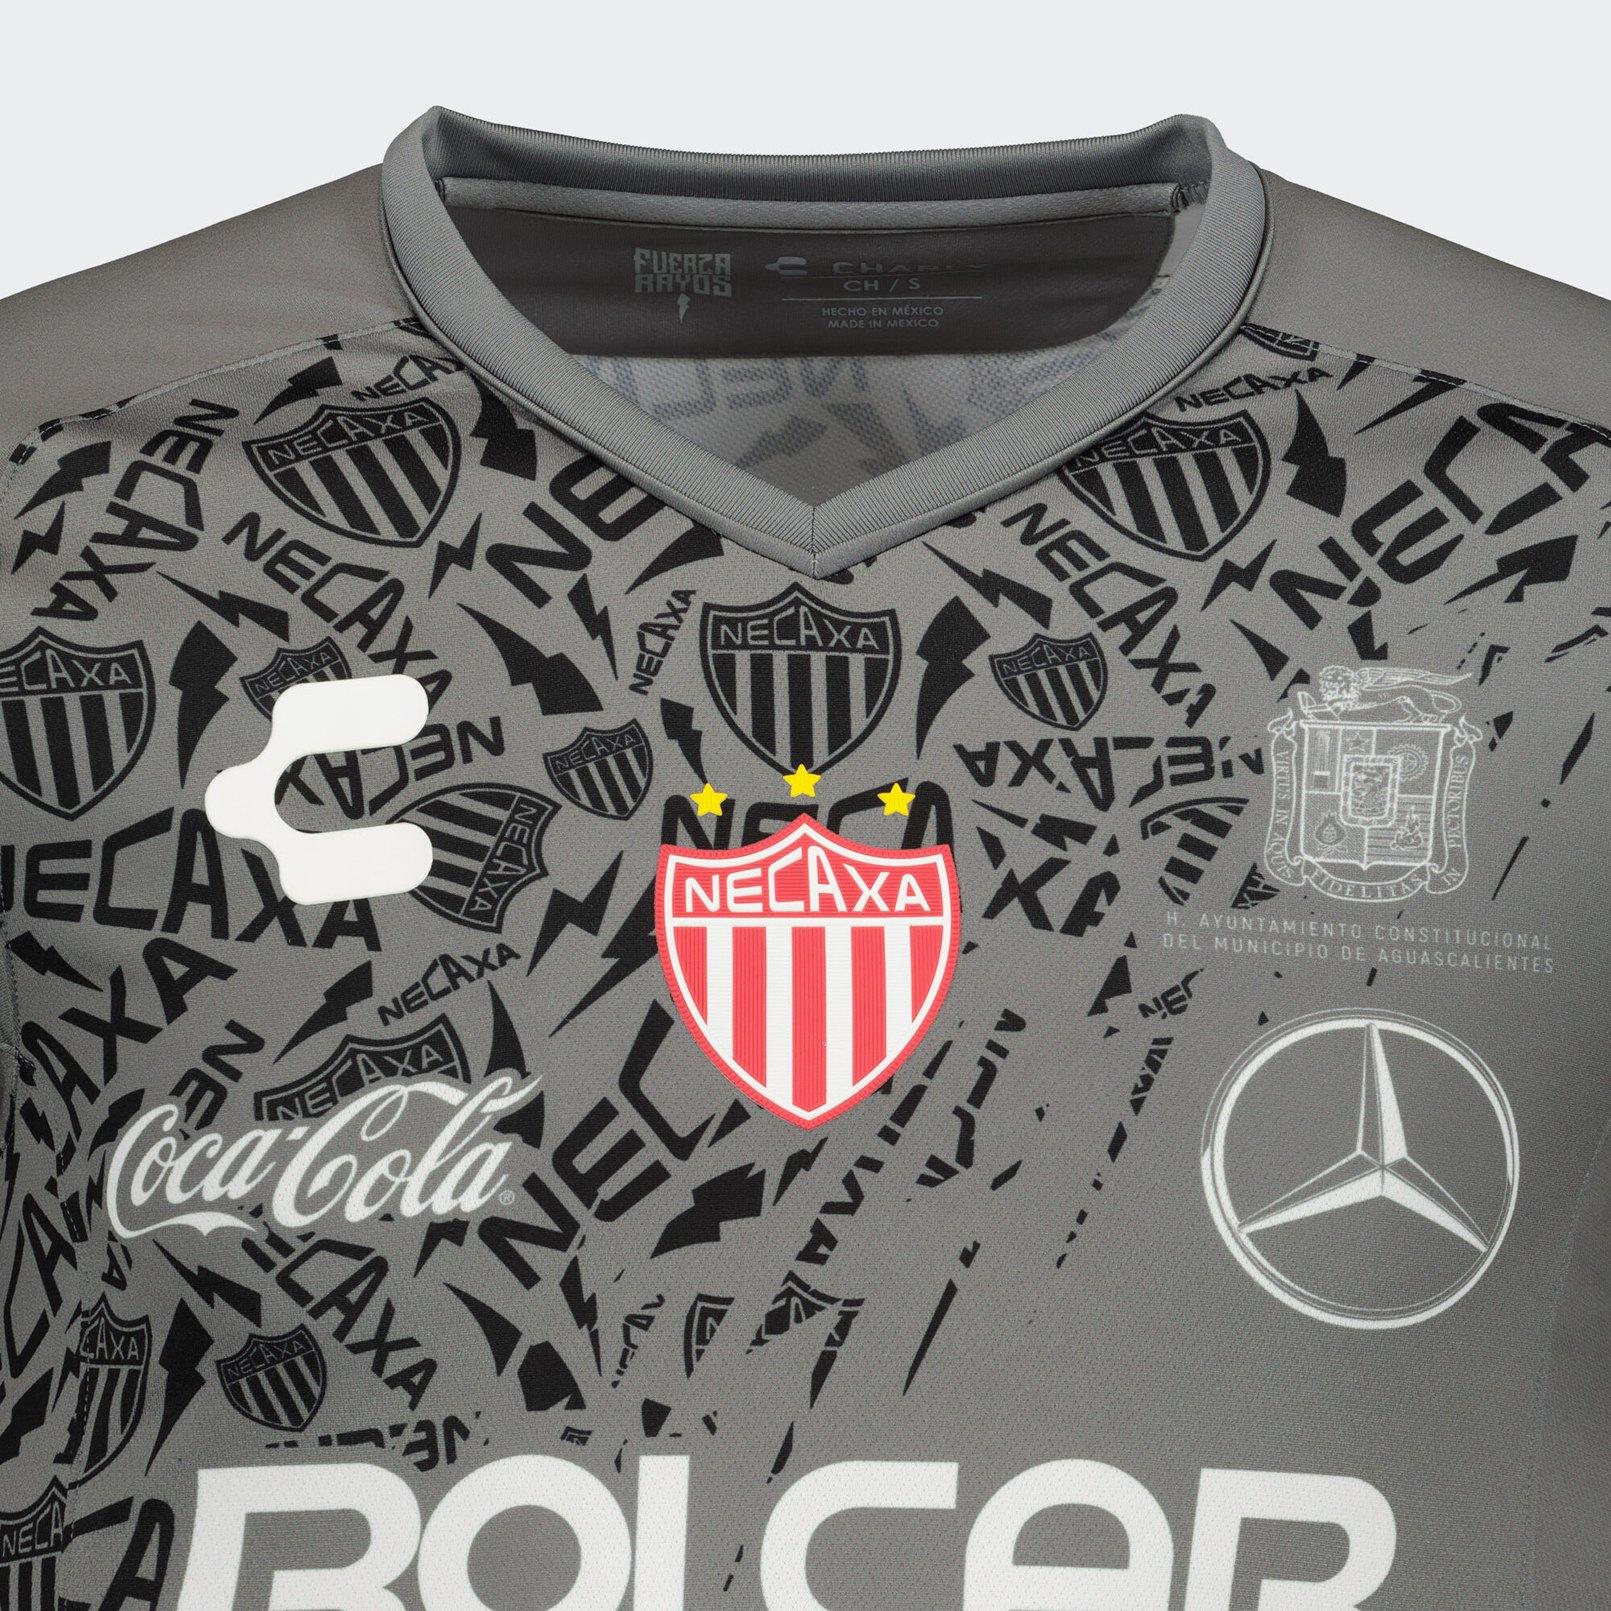 Camiseta visita del Club Necaxa 2019/2020 | Imagen Charly